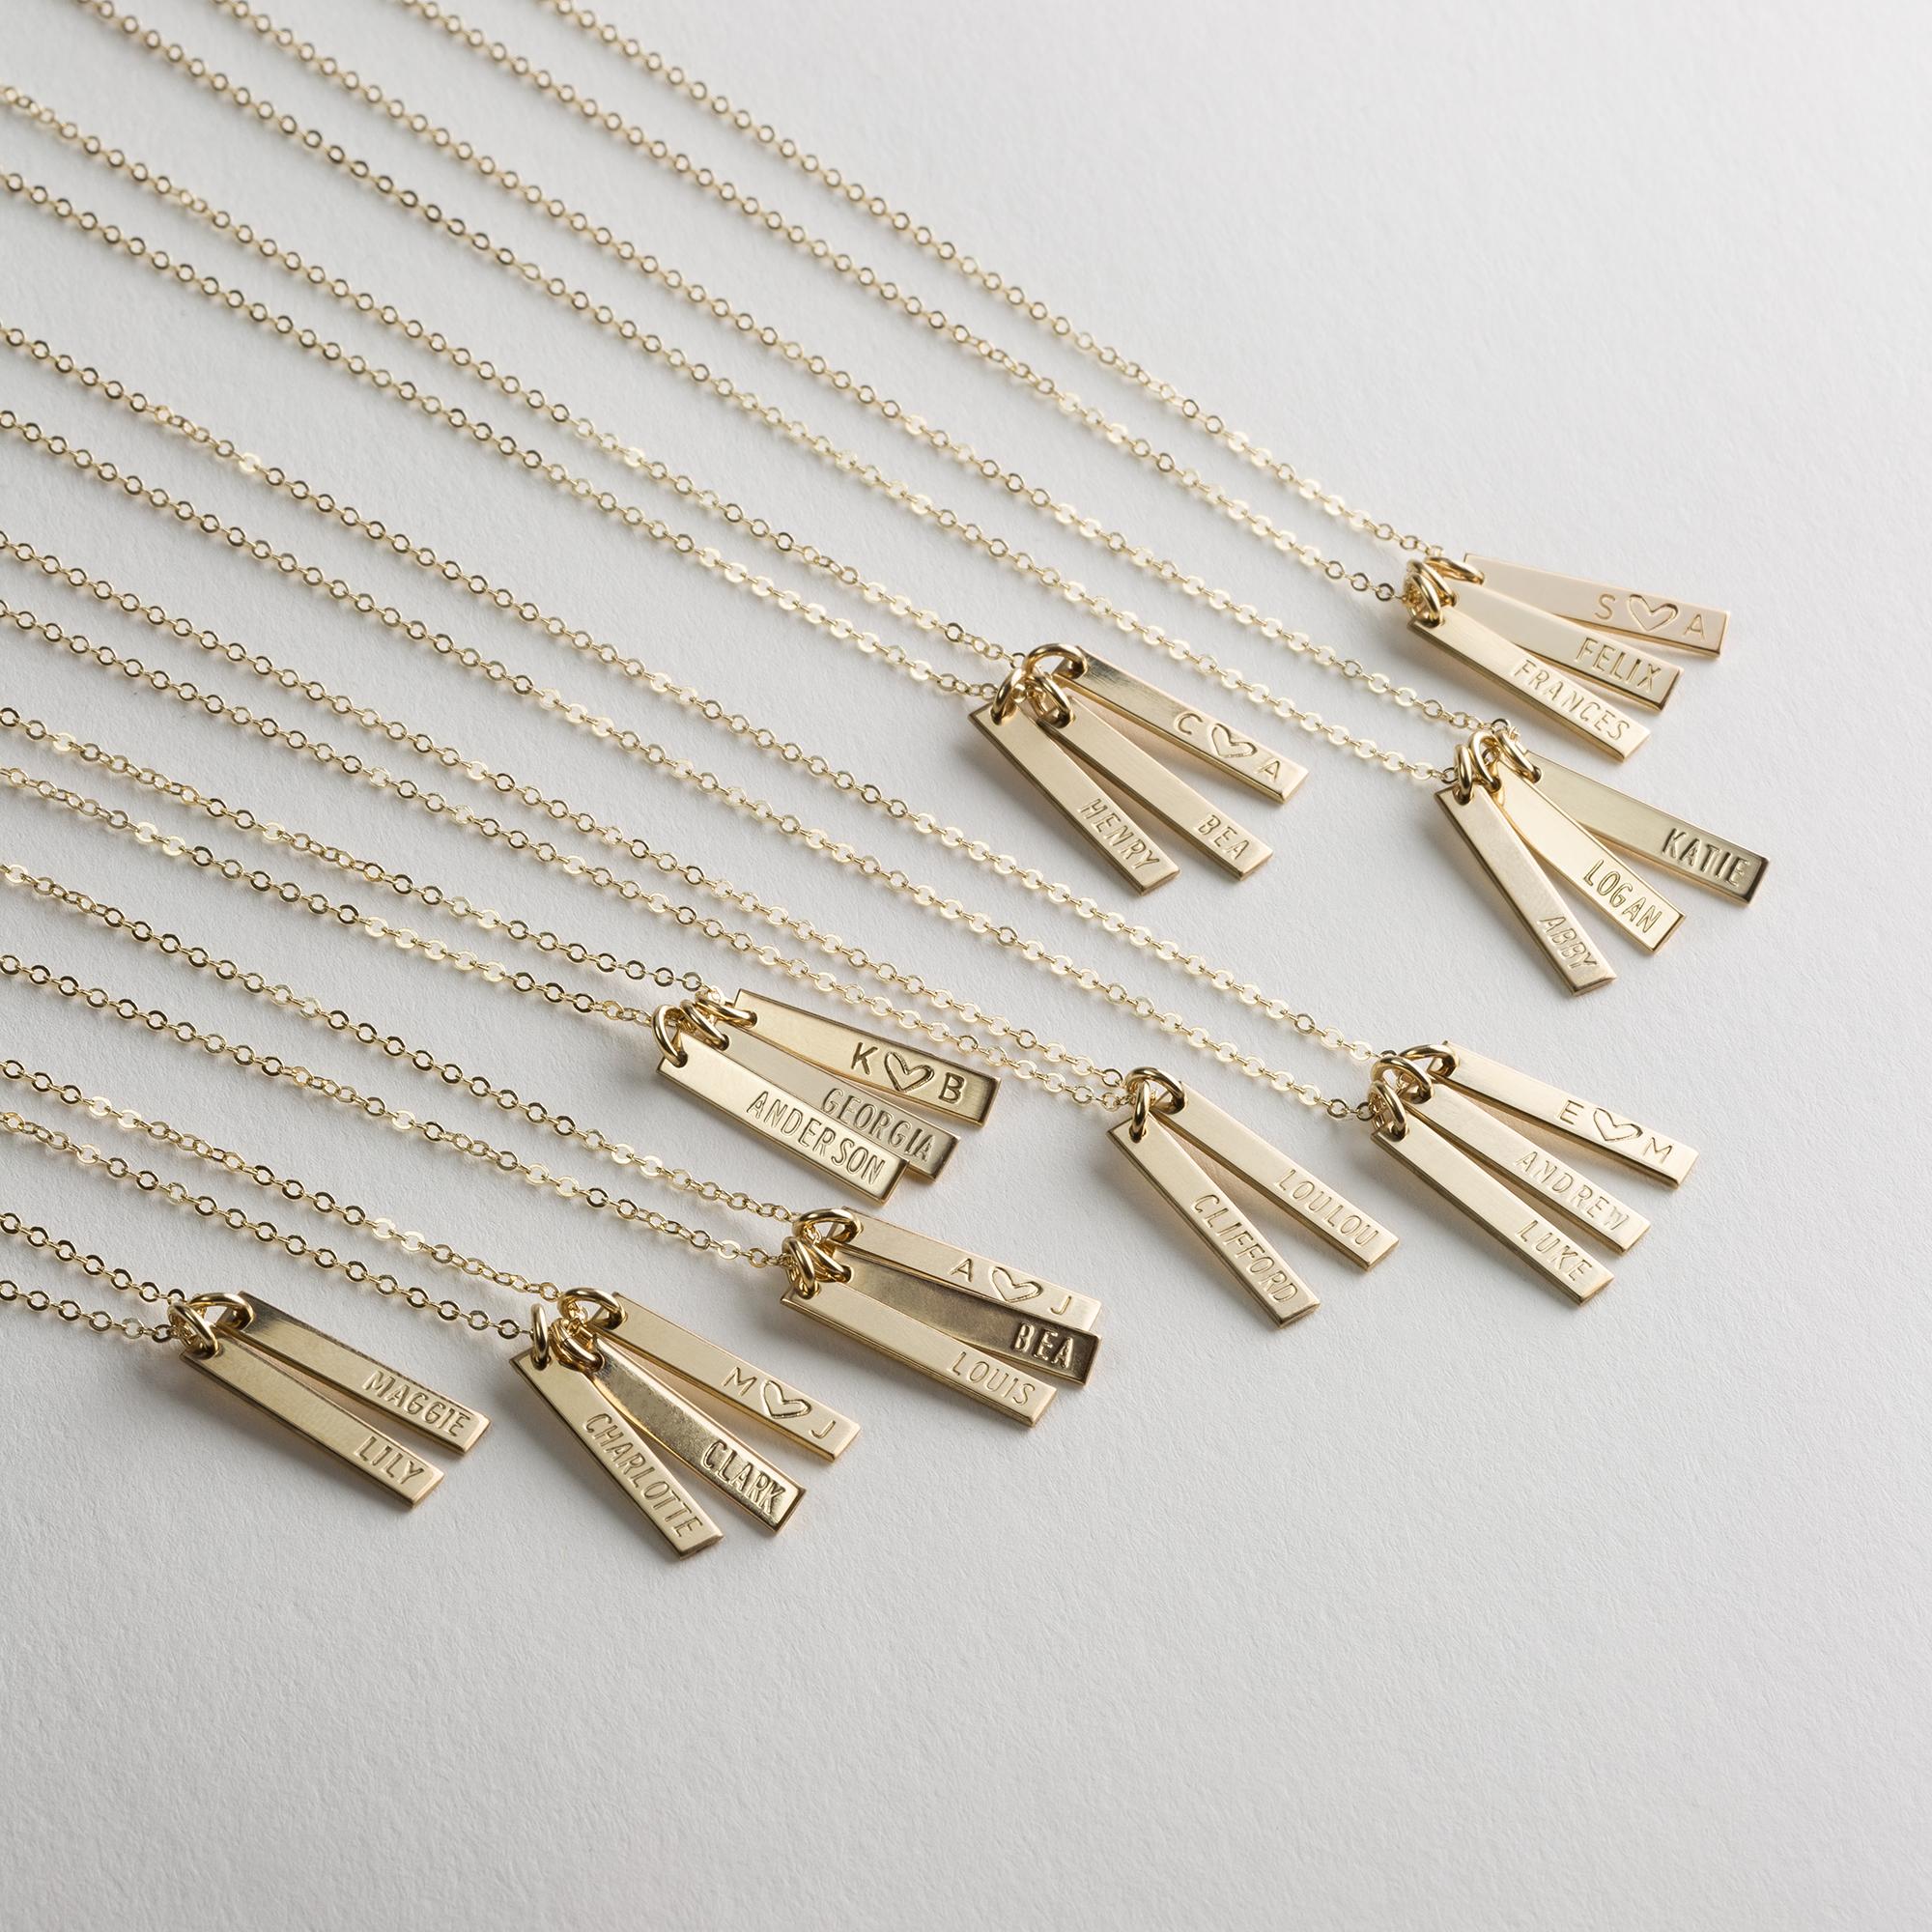 e12ad0b16 Ono Vertical Bar Tags Necklace — GLDN